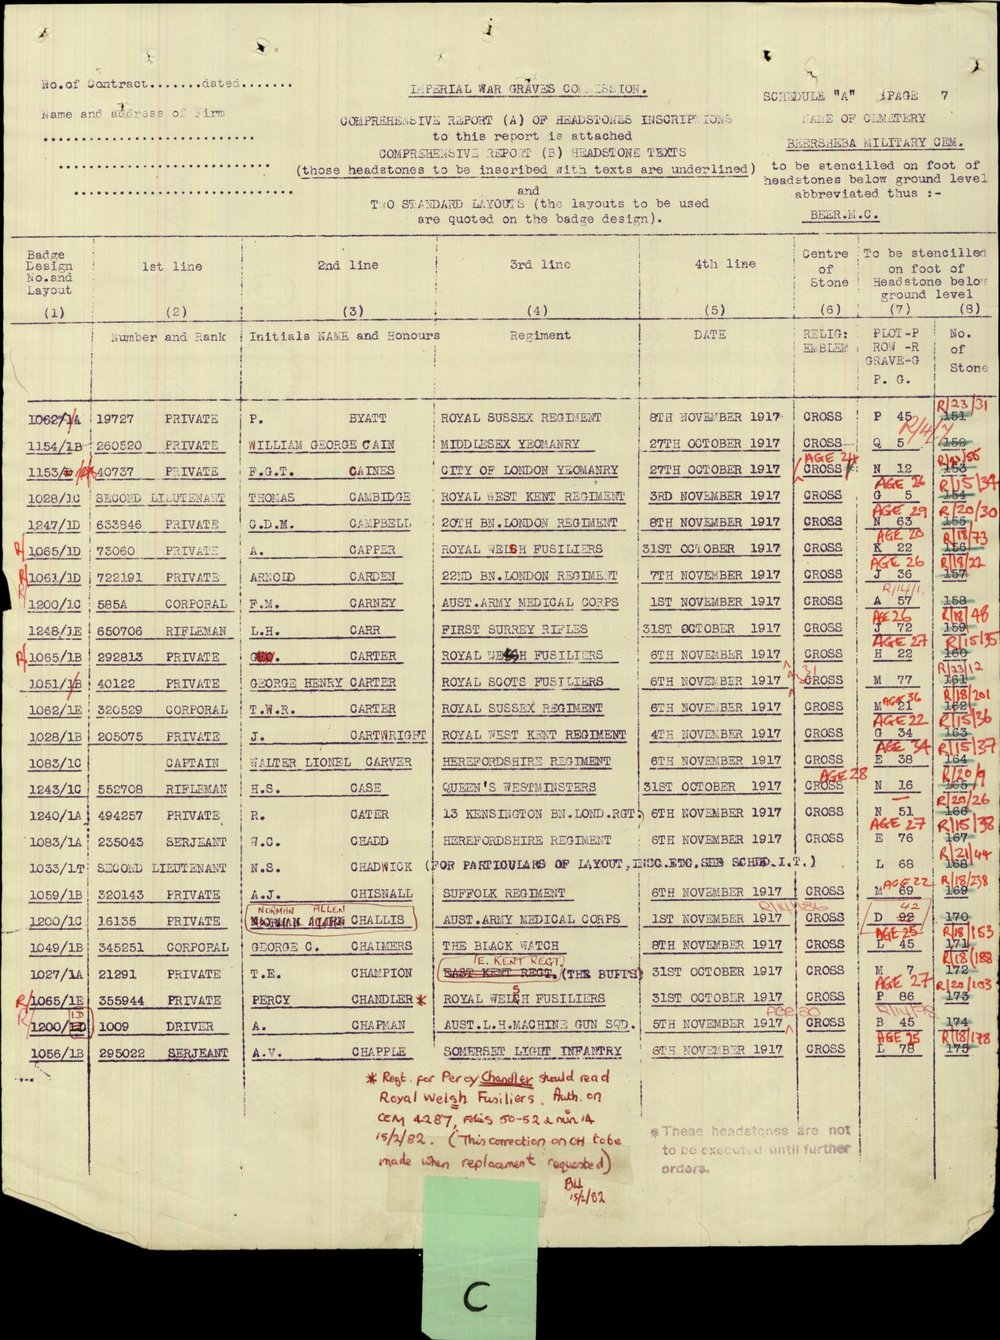 A J Chisnall headstone schedule 1.JPG